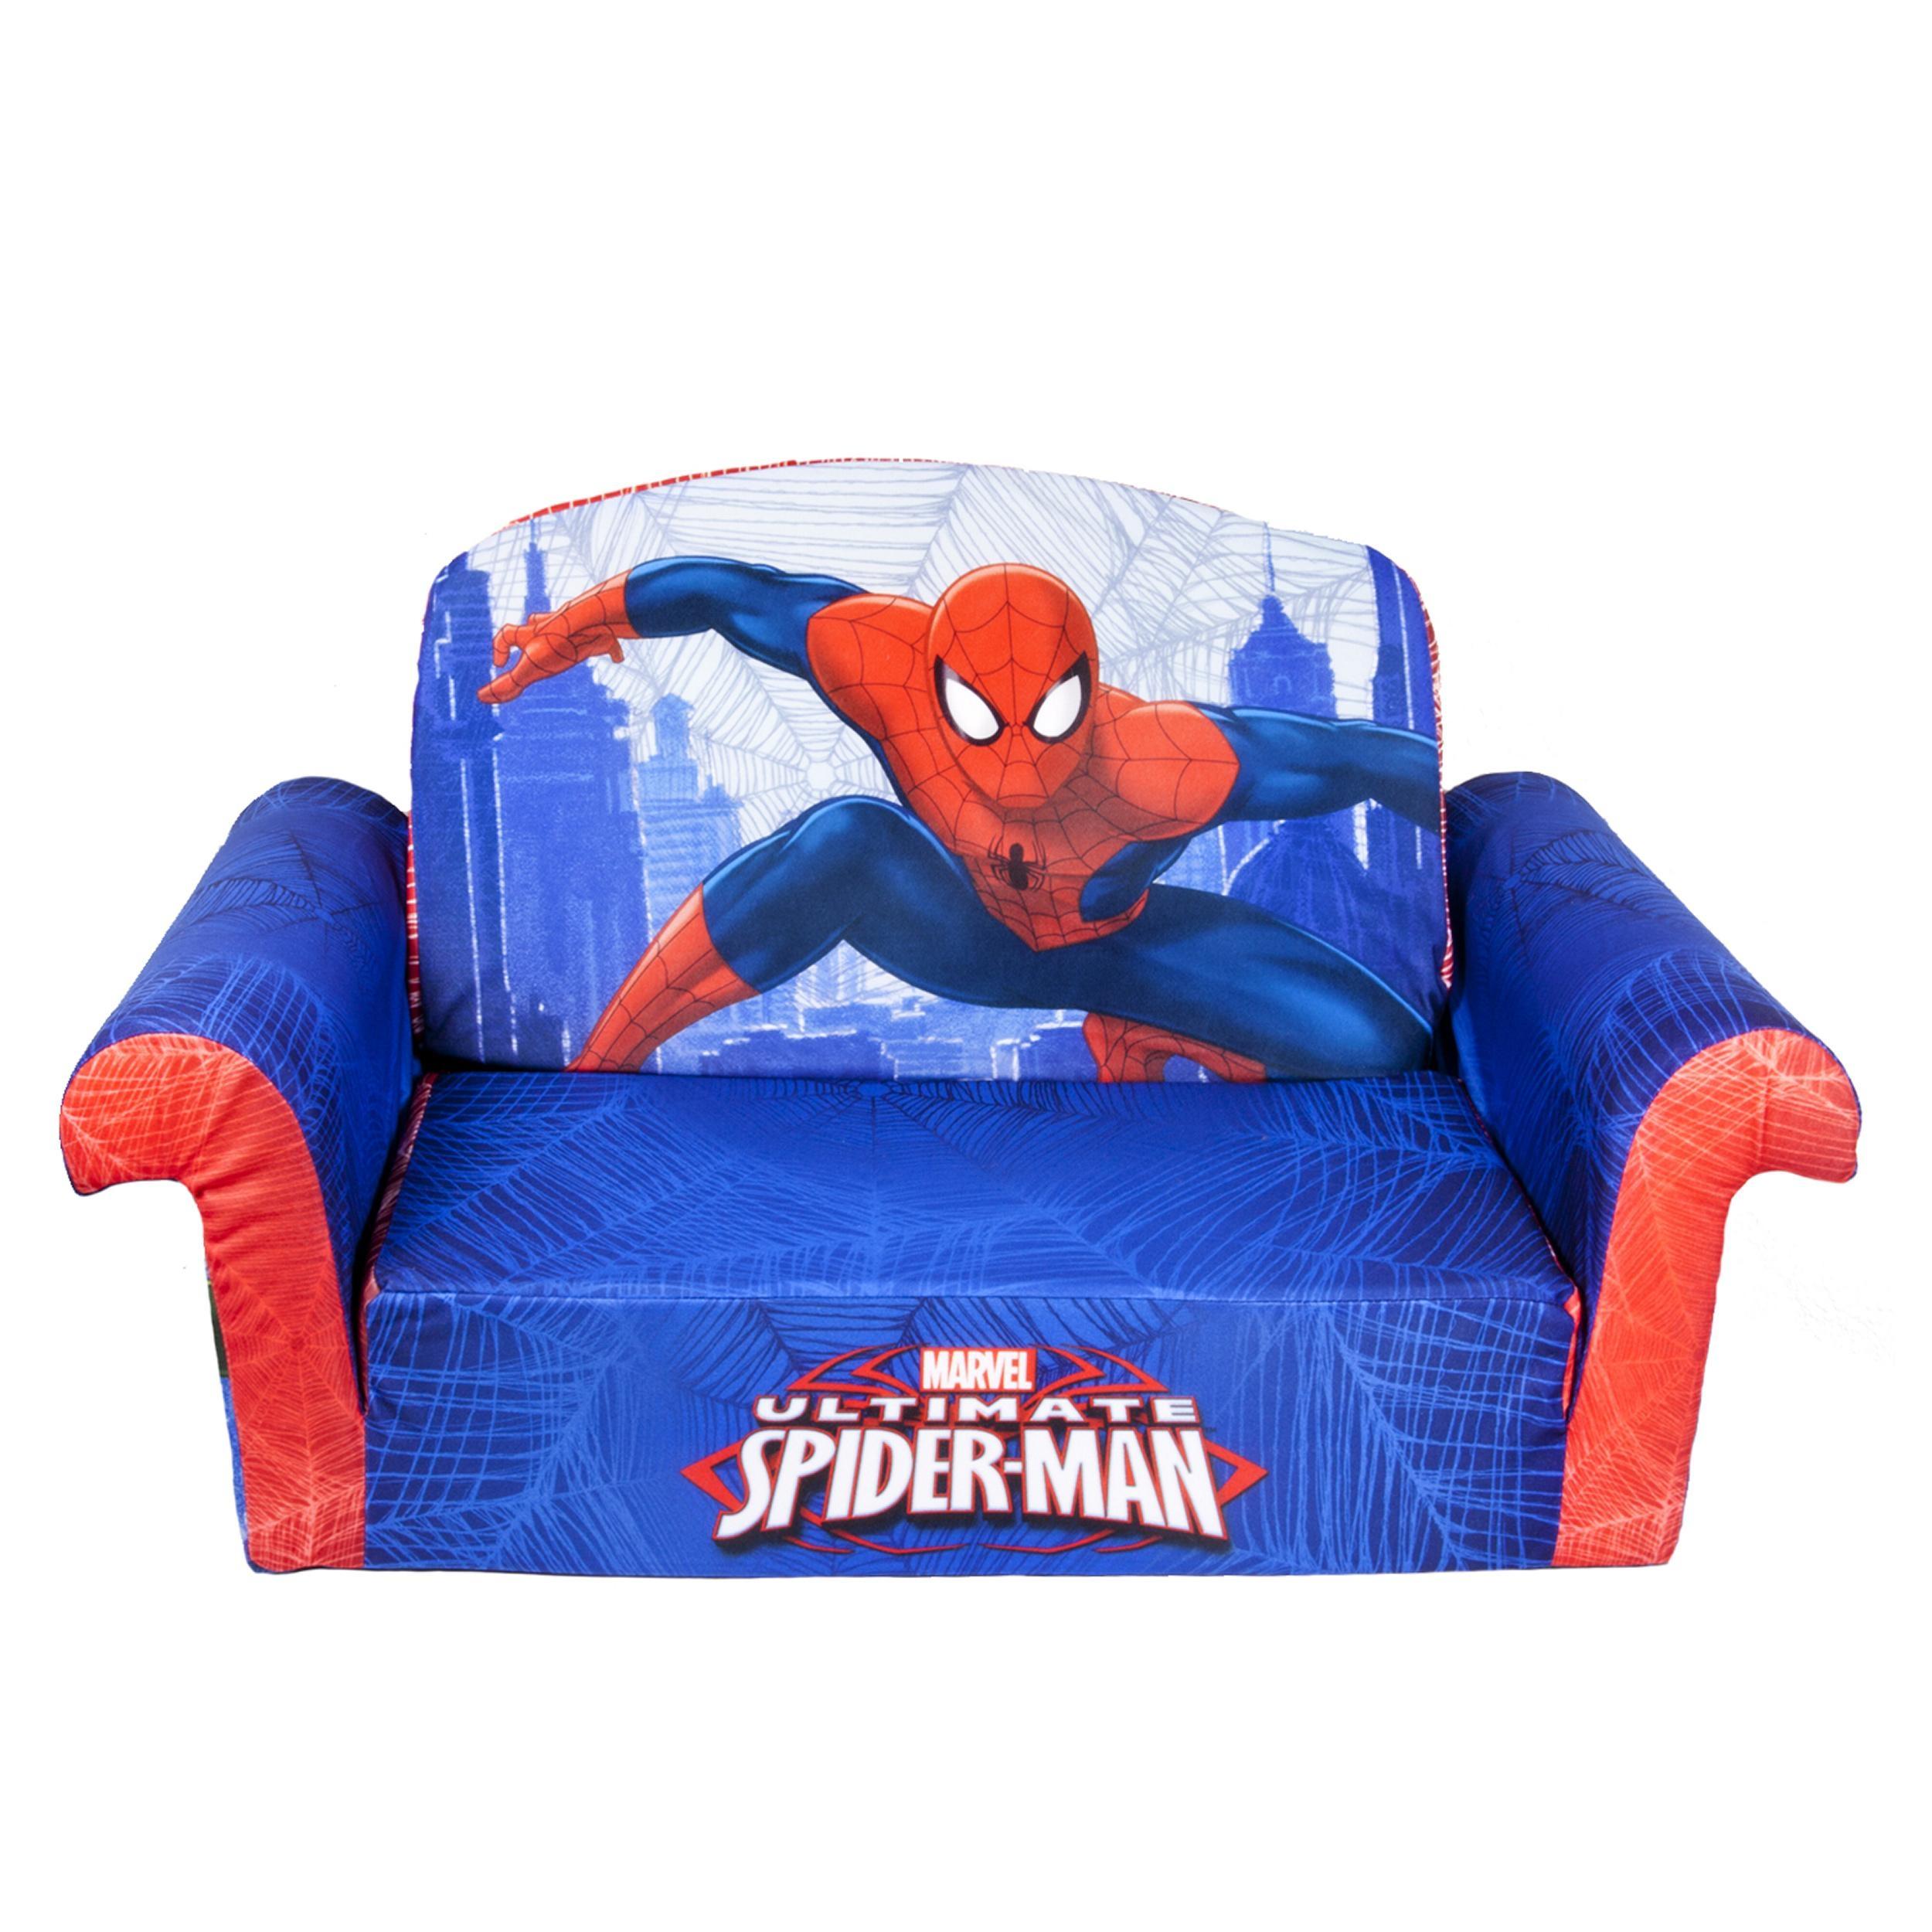 Kids Flip Open Sofa intended for Kid Flip Open Sofa Beds